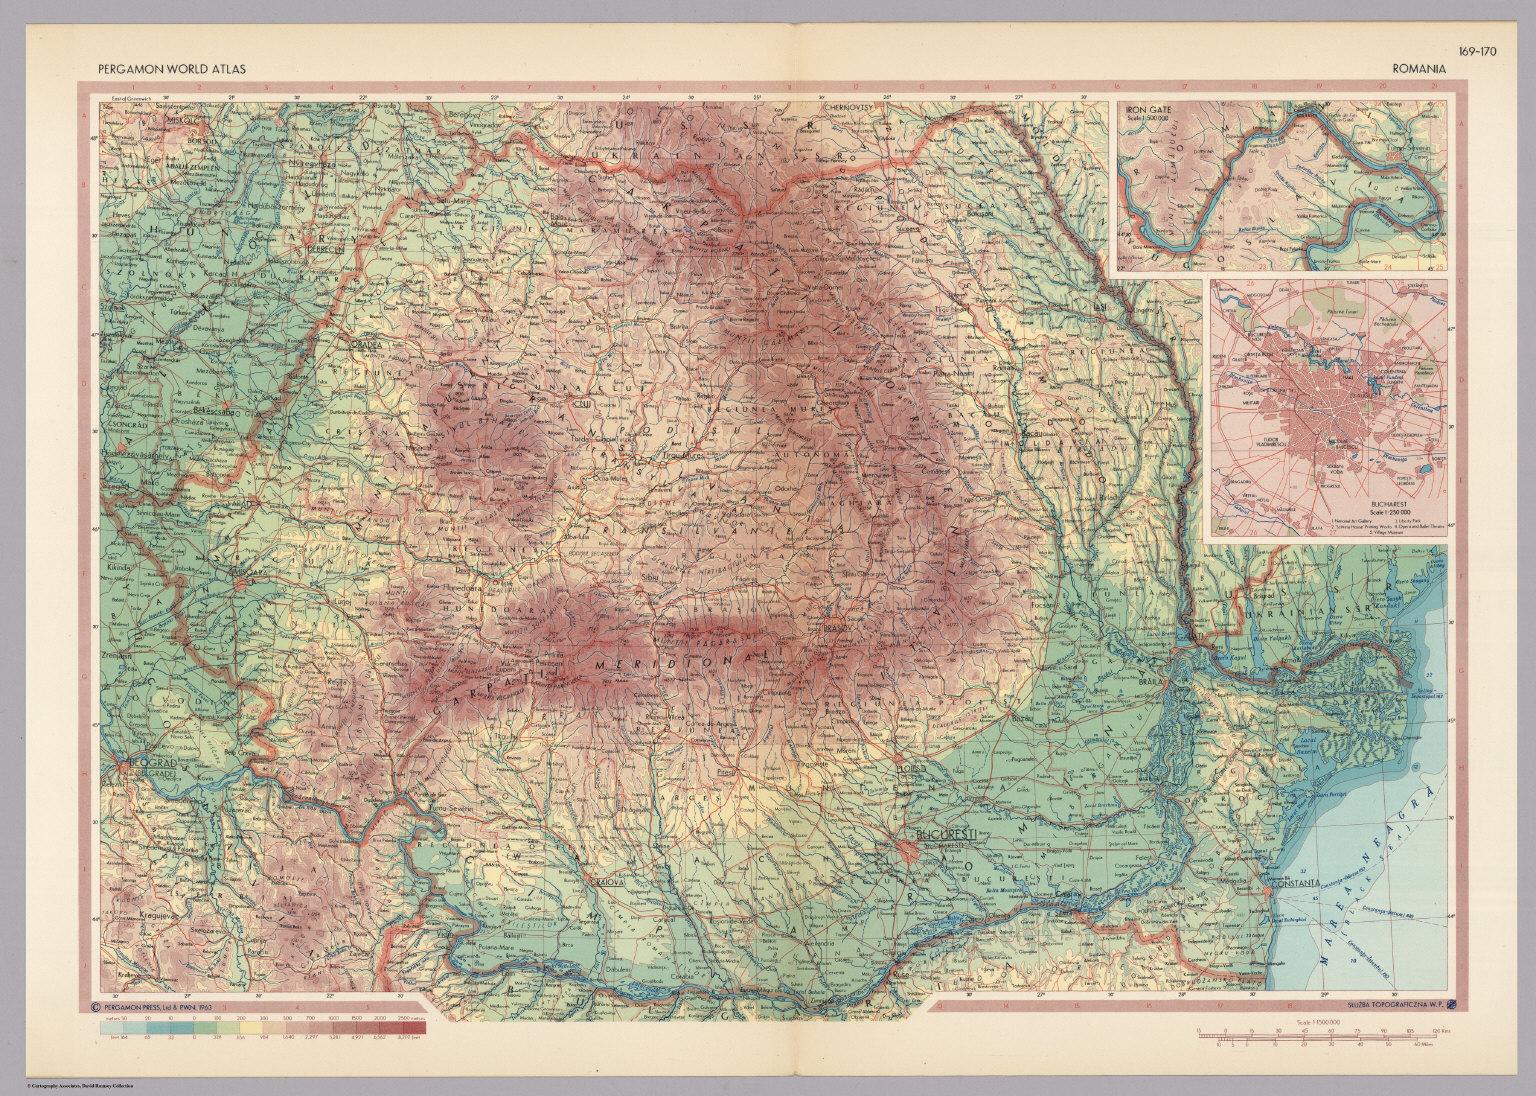 Romania pergamon world atlas david rumsey historical map collection romania pergamon world atlas gumiabroncs Choice Image